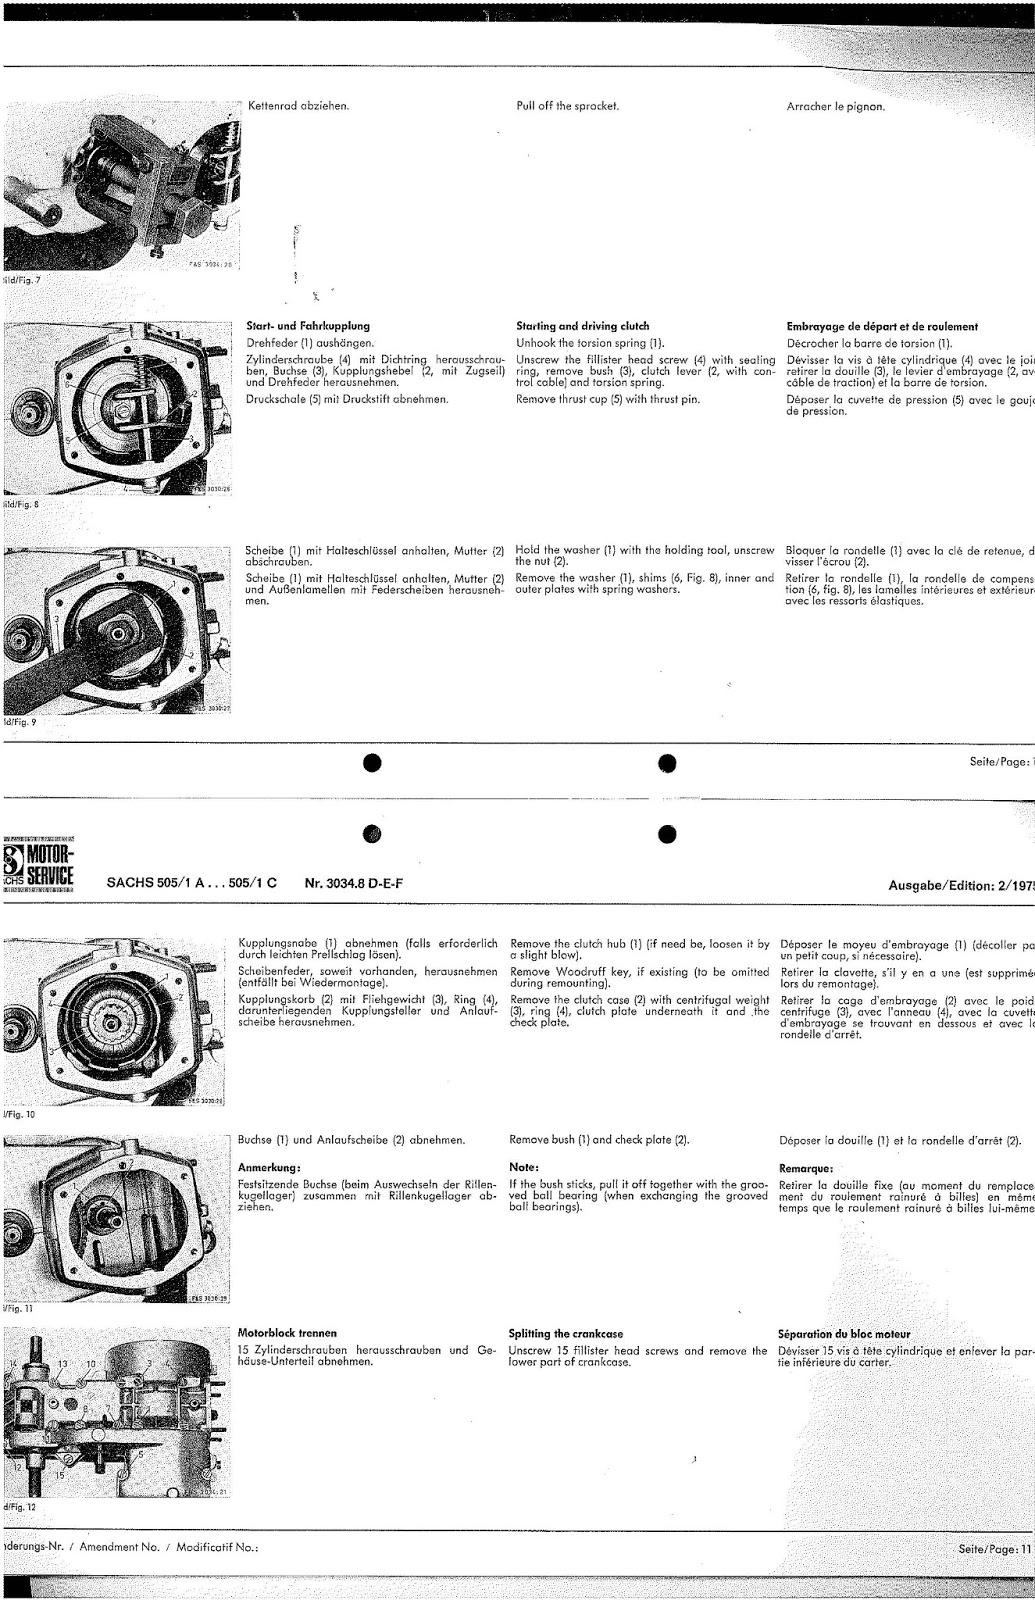 sachs 505 engine manual